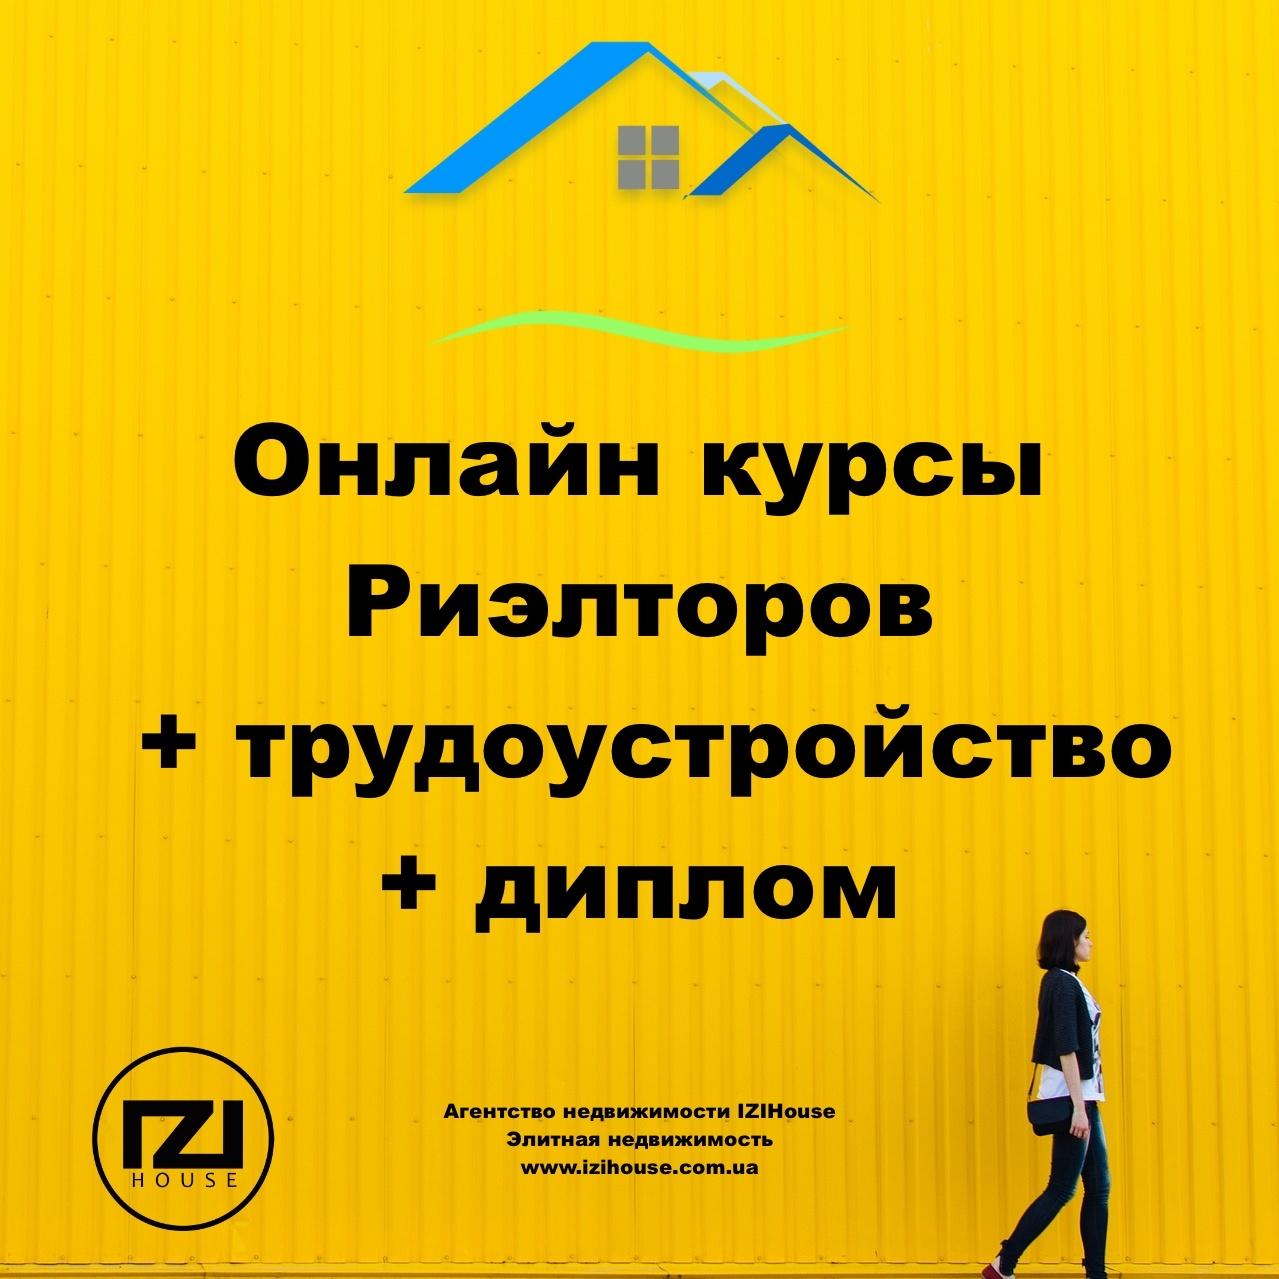 "Онлайн обучение профессии ""Агент по недвижимости"" + трудоустройство!"